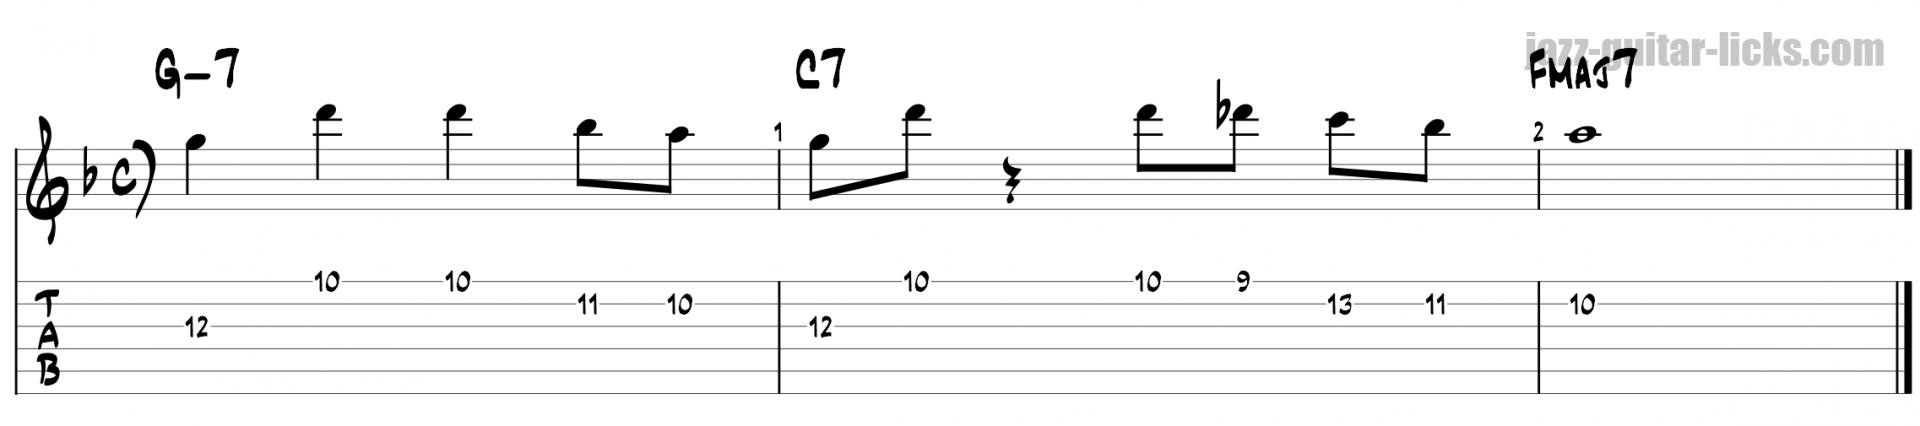 Miles davis jazz guitar lick